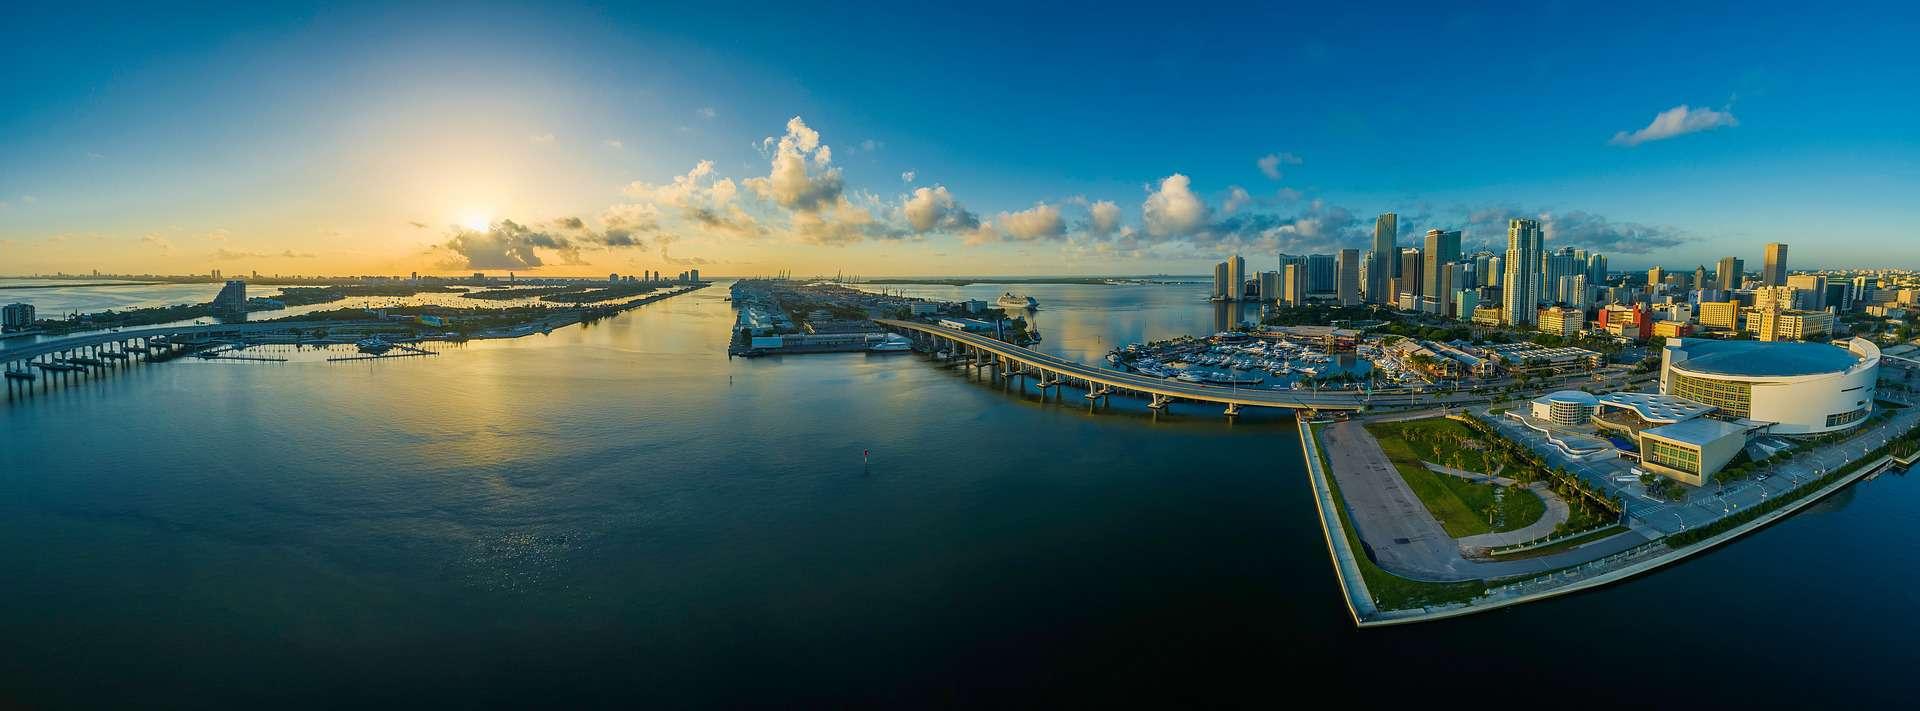 Gay Miami · Ξενοδοχεία